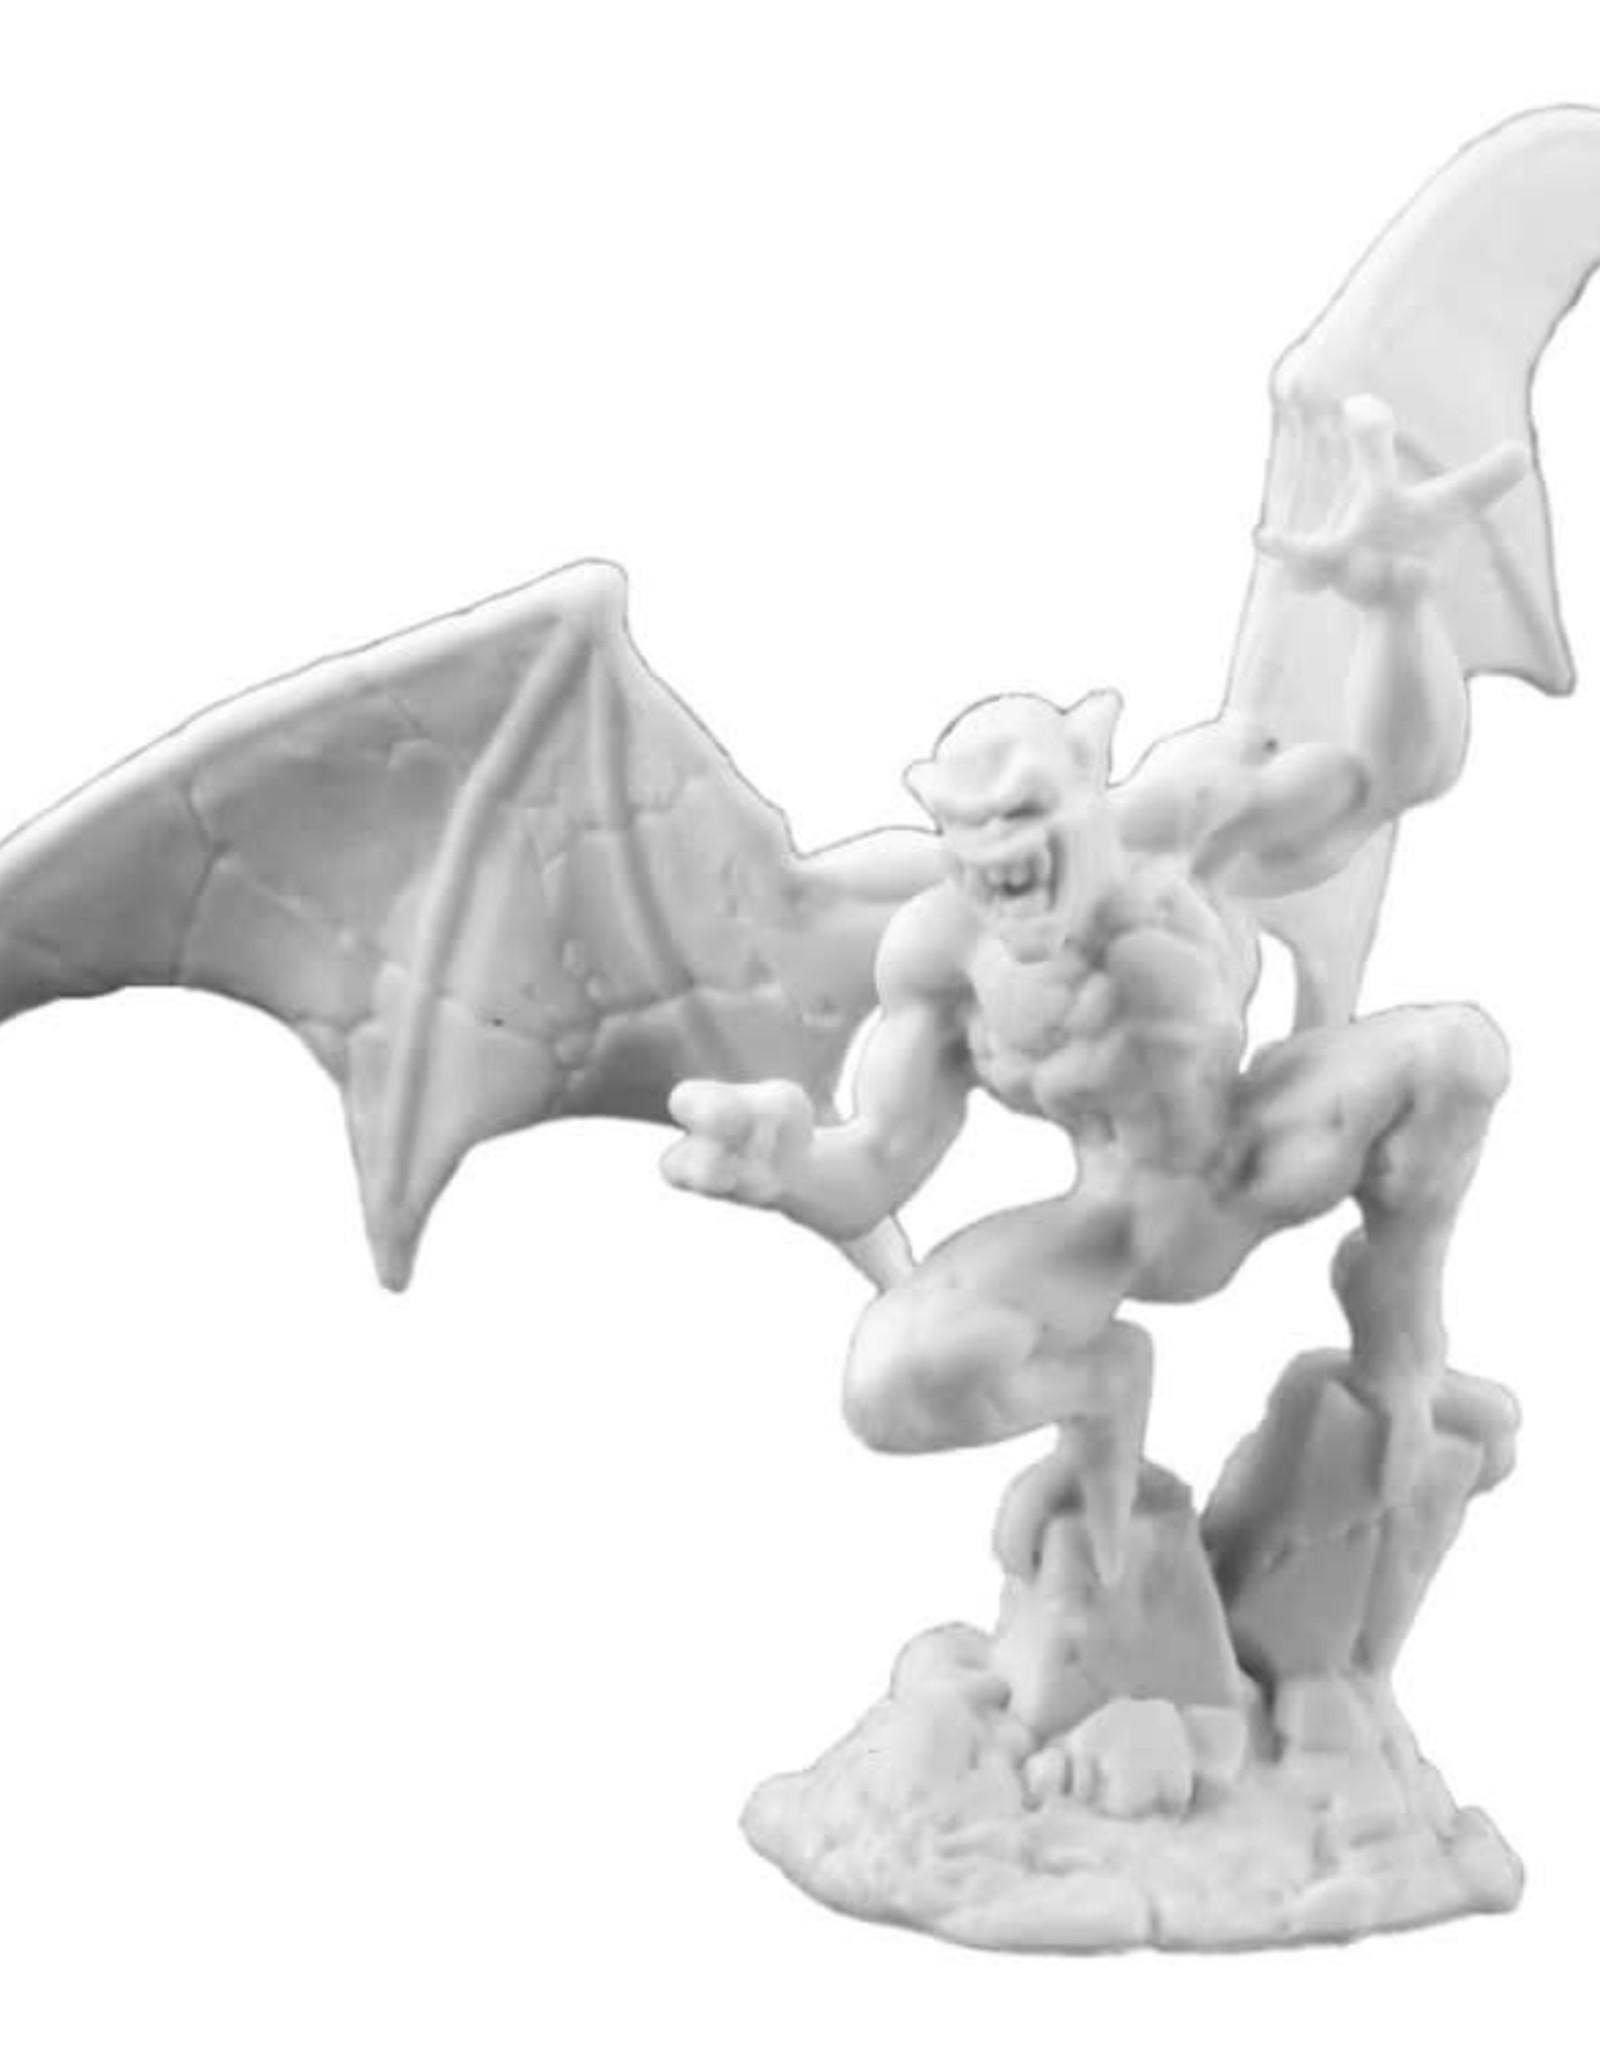 Bones Mortar the Gargoyle